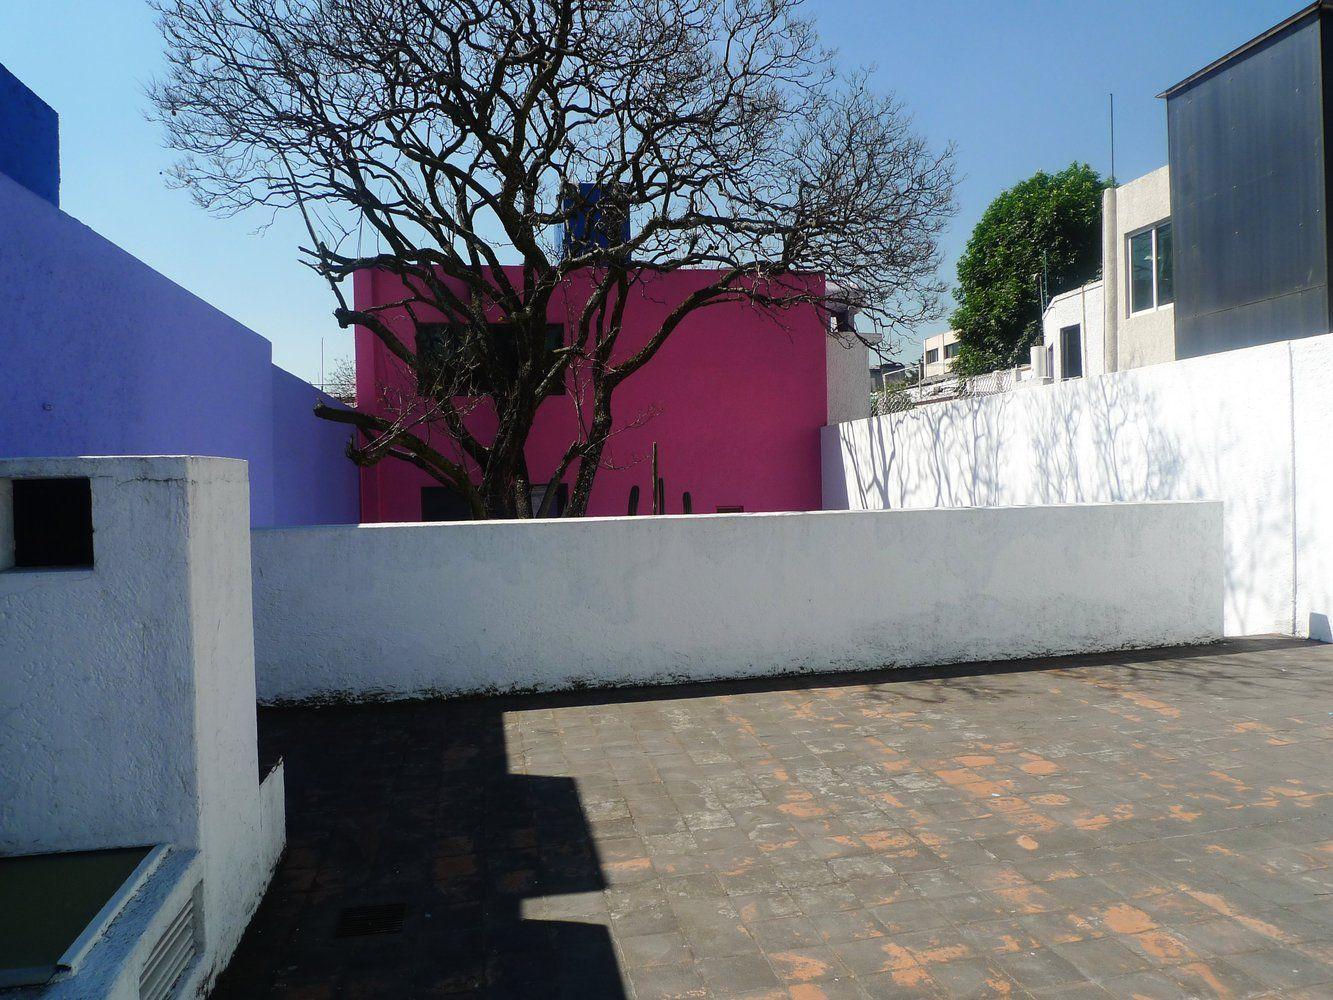 Clásicos de Arquitectura: Casa Gilardi / Luis Barragán,Usuario de Flickr: pov steve. Used under <a href='https://creativecommons.org/licenses/by-sa/2.0/'>Creative Commons</a>